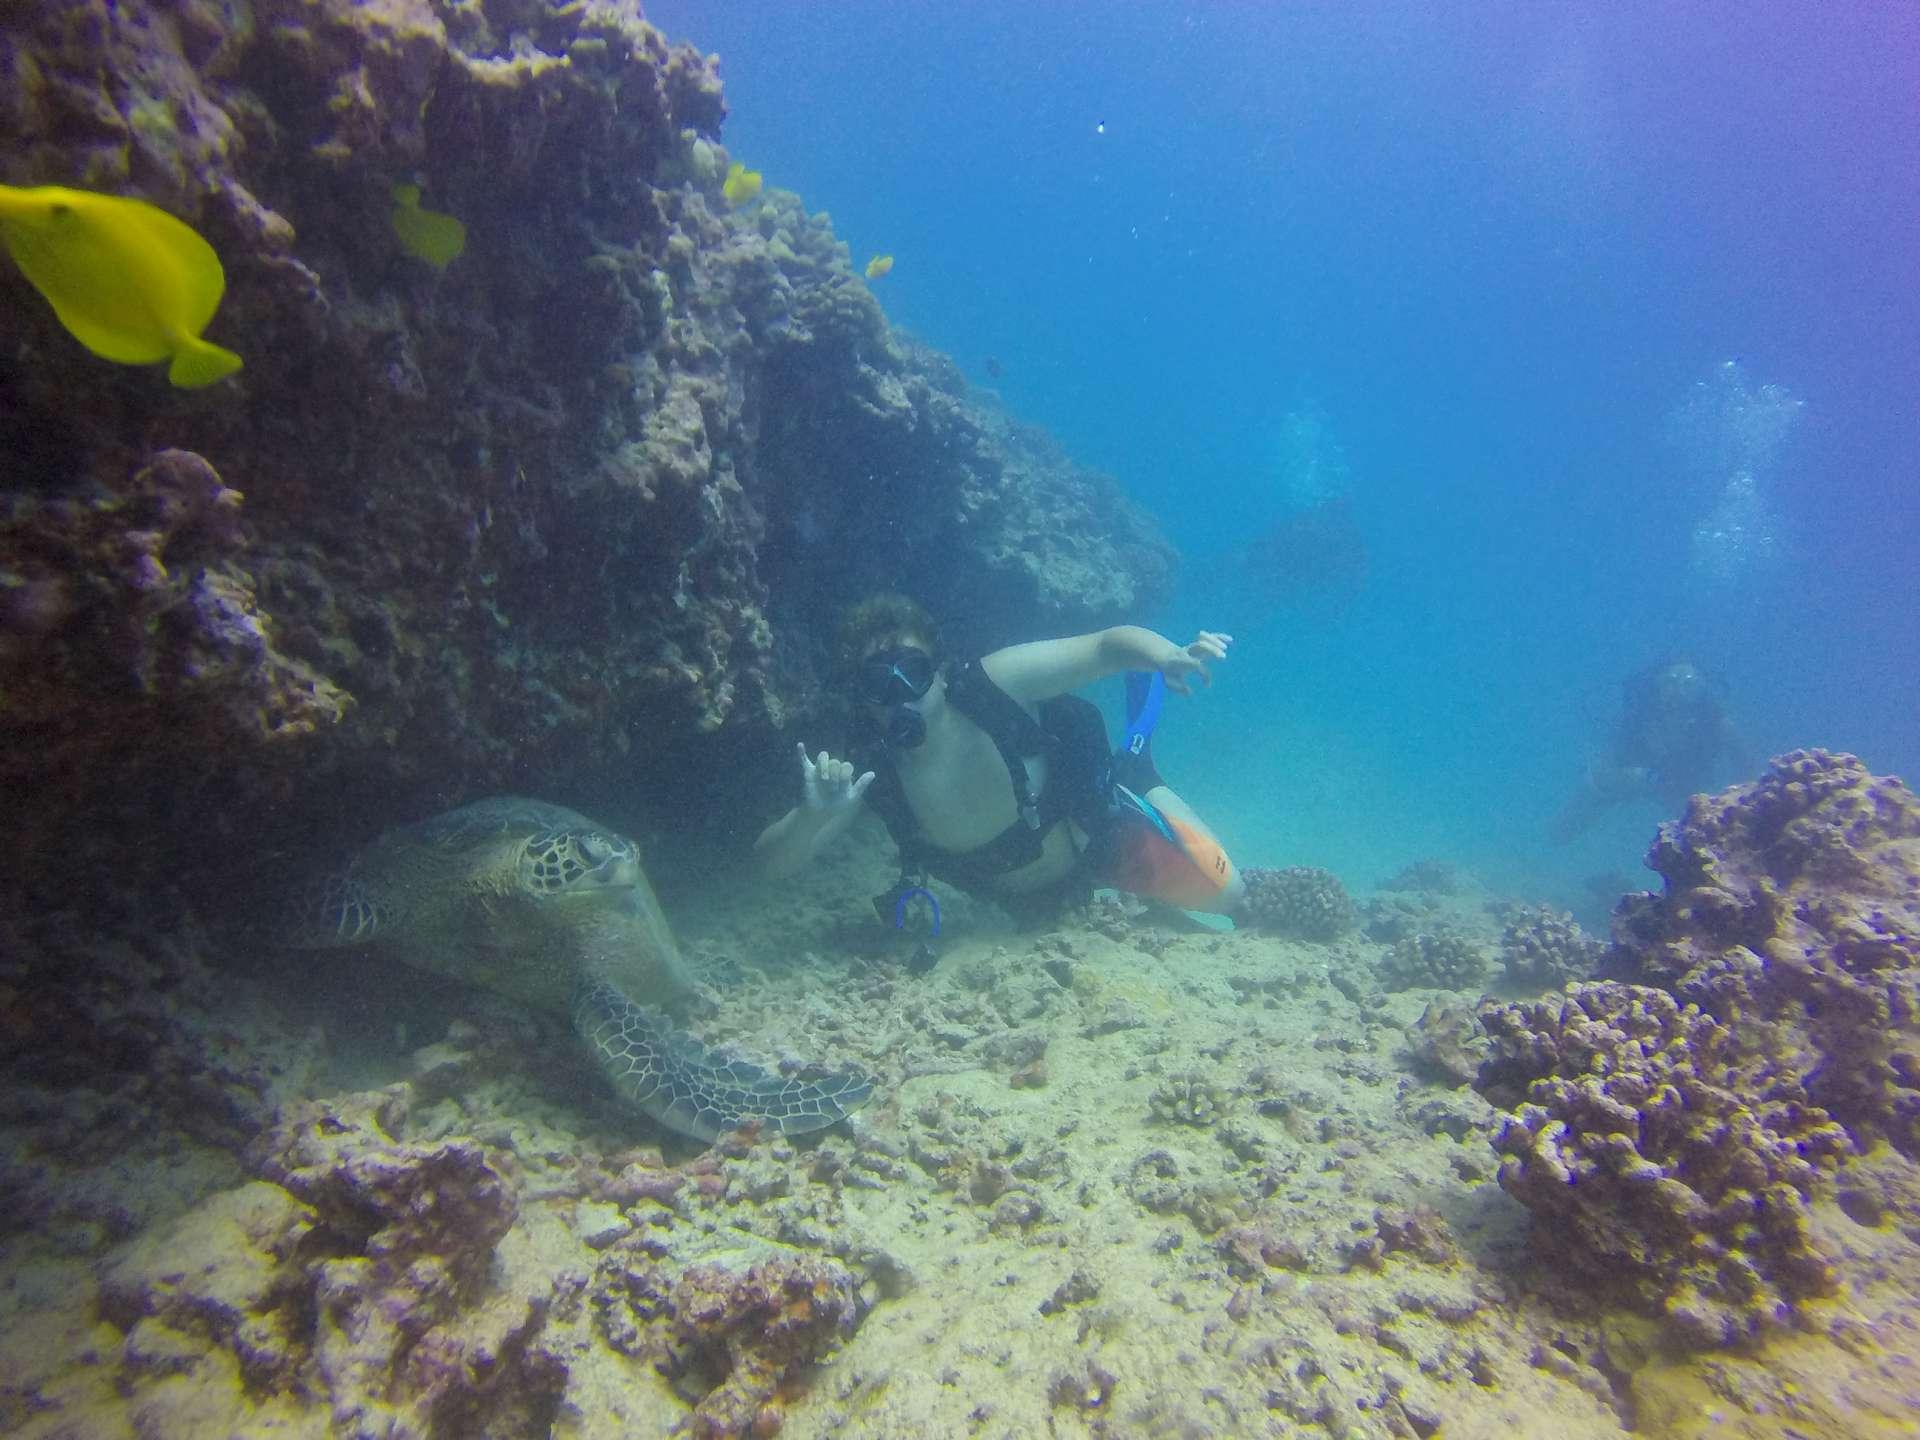 Hawaii Scuba Diving 10 01 2016